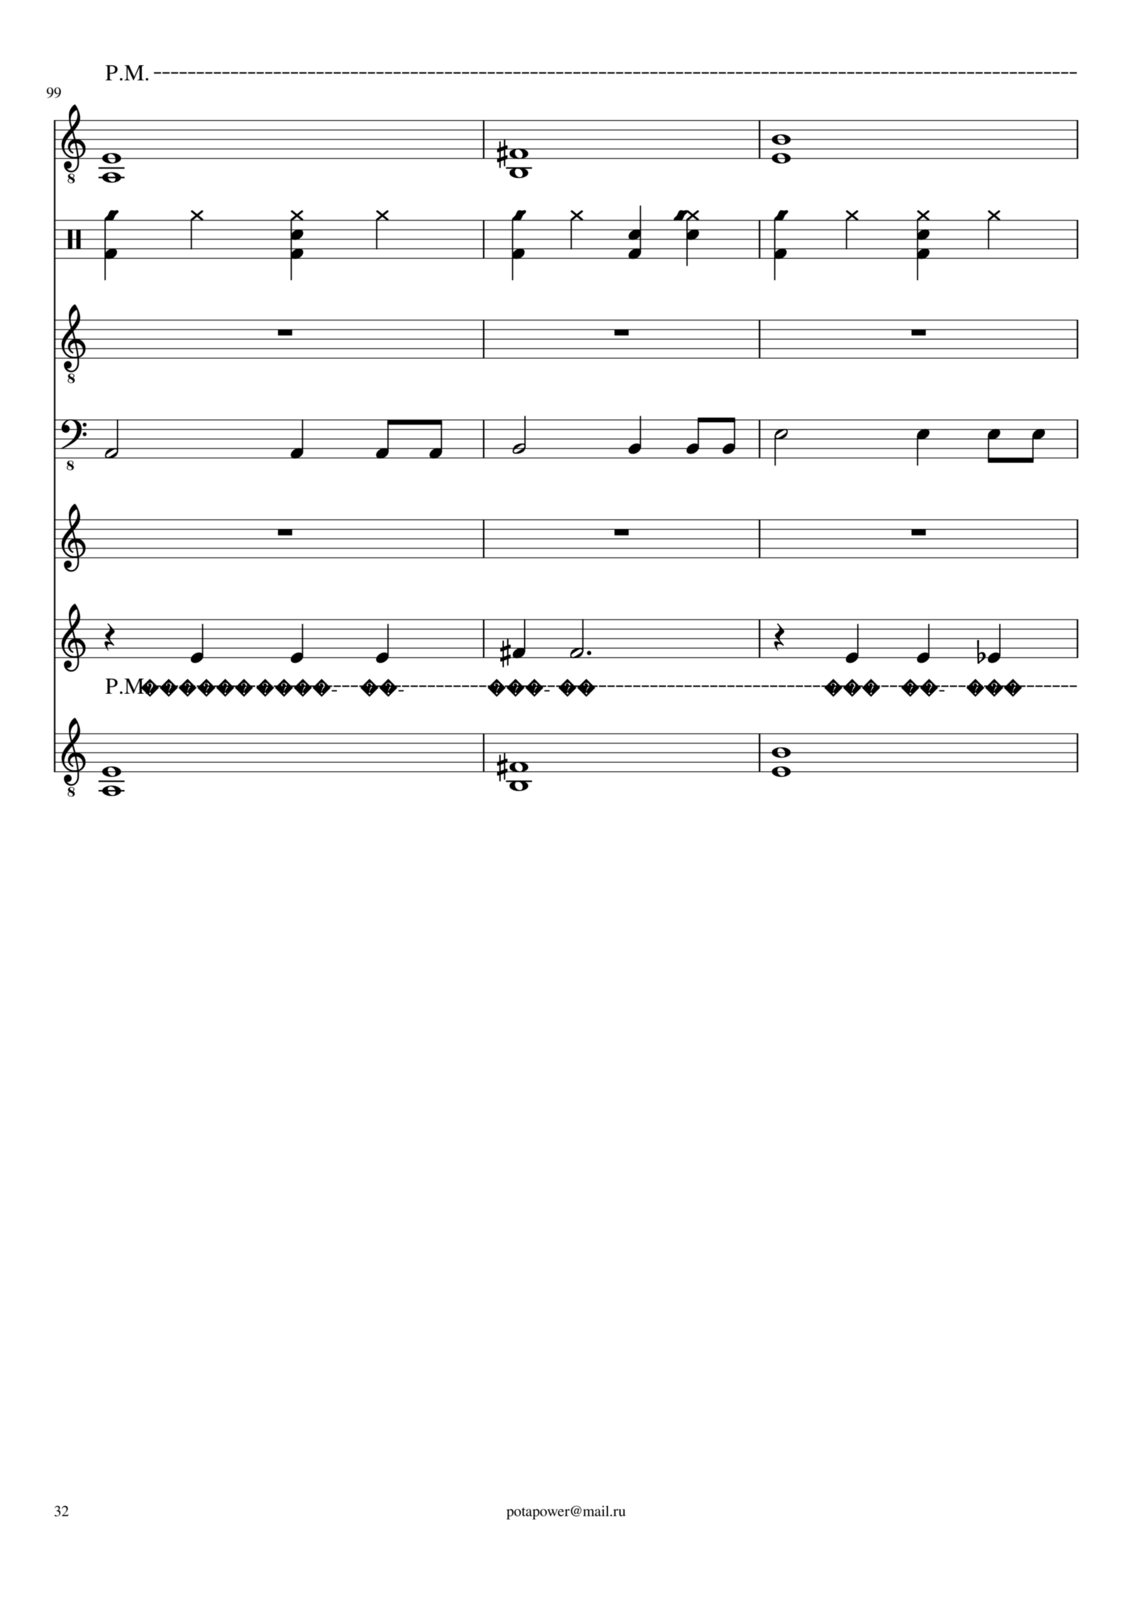 Ten lyubvi slide, Image 32